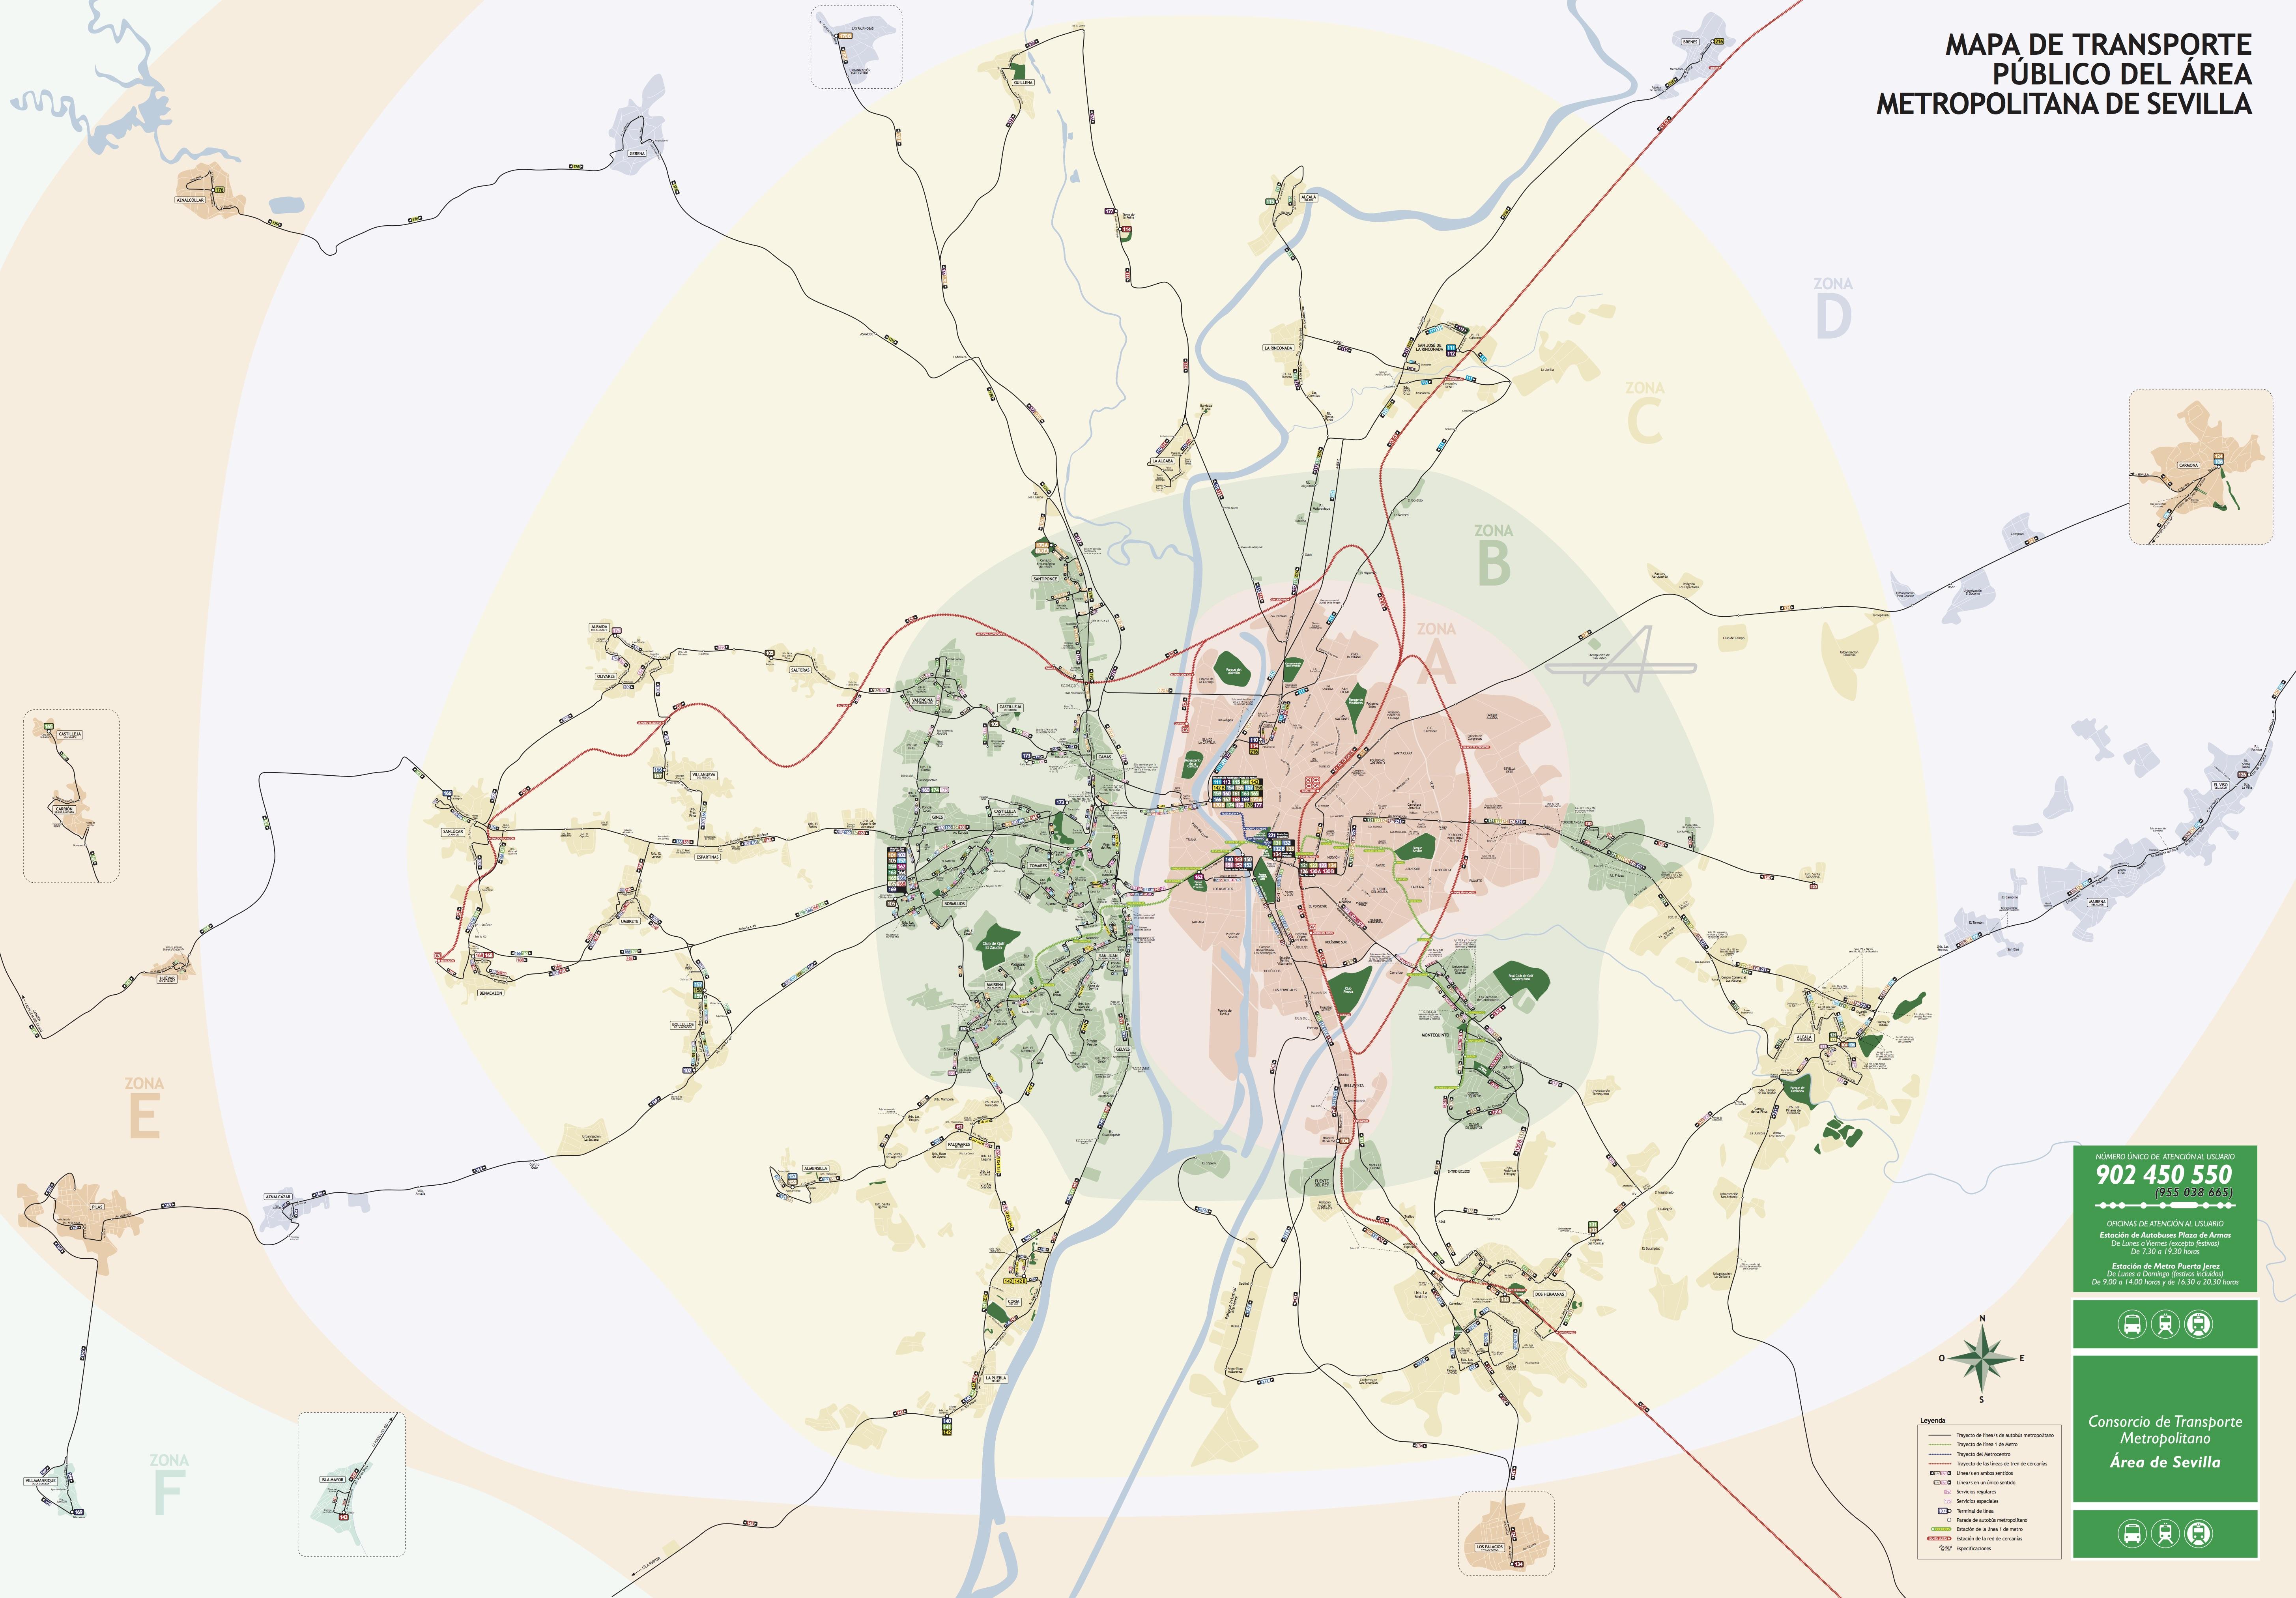 Plano de Autobuses Metropolitanos de Sevilla